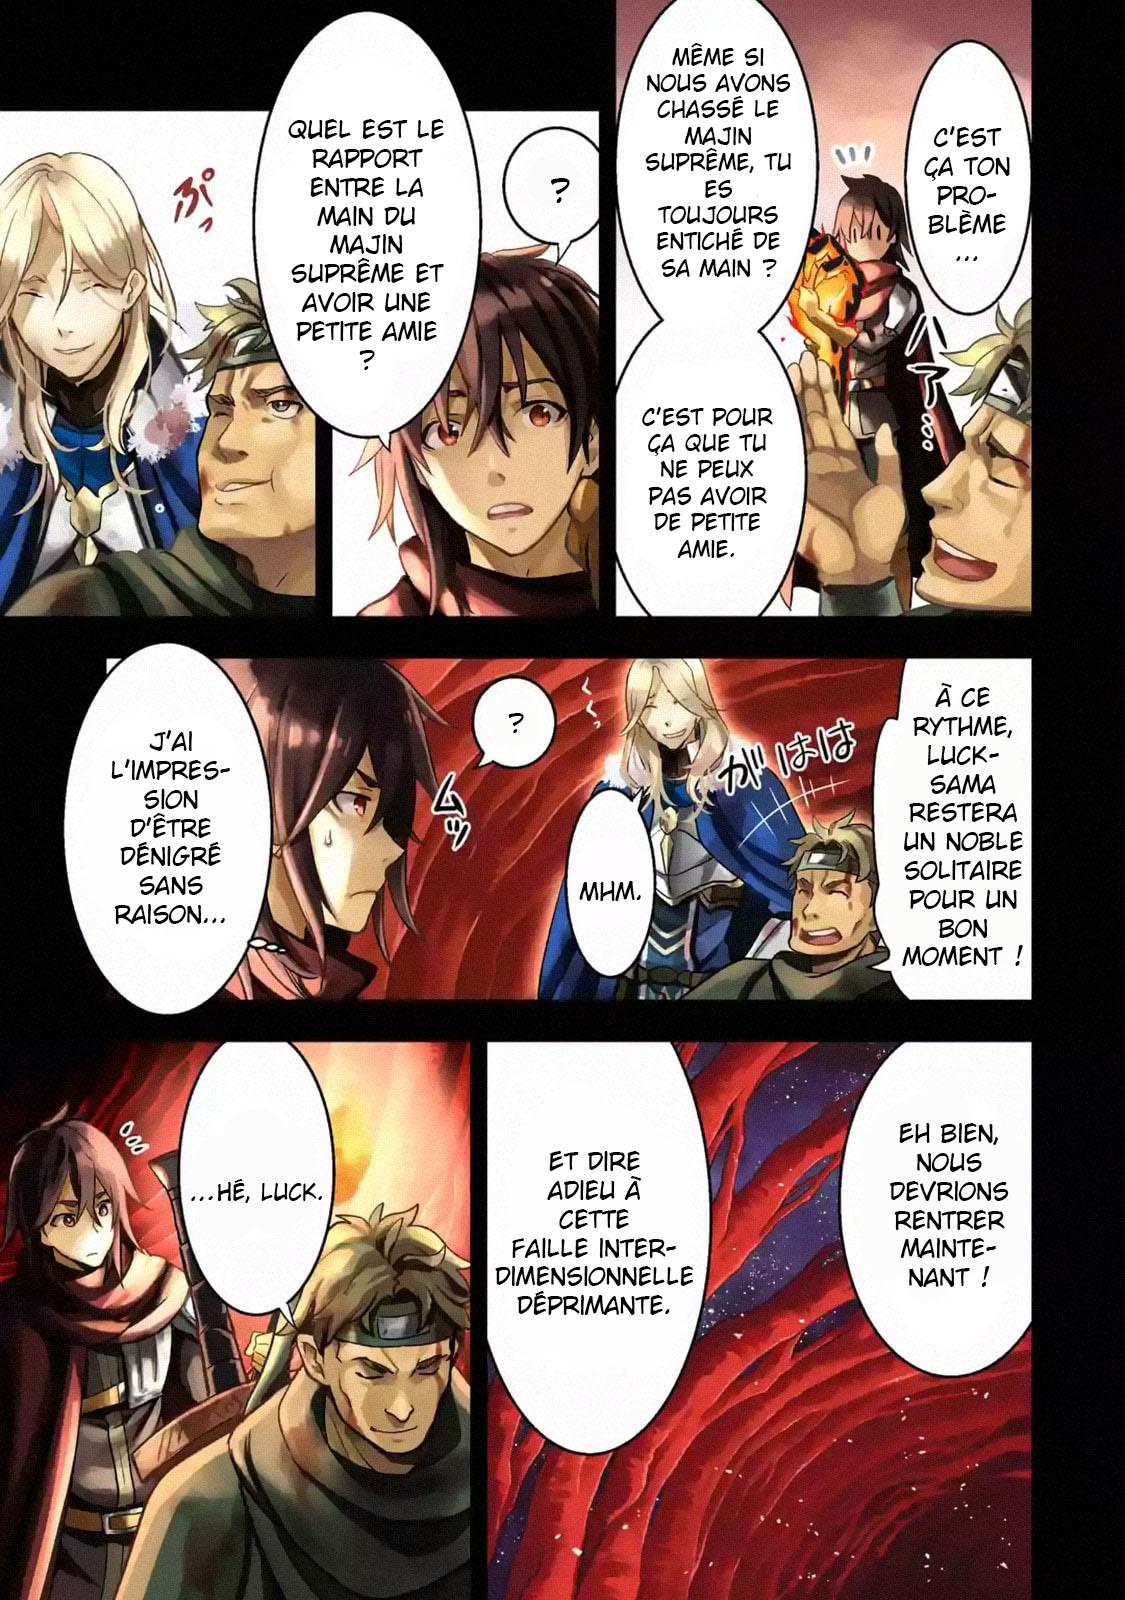 https://nine.mangadogs.com/fr_manga/pic2/49/8369/349149/3923540ac74f6ce3aa9fa97326f7c238.jpg Page 4